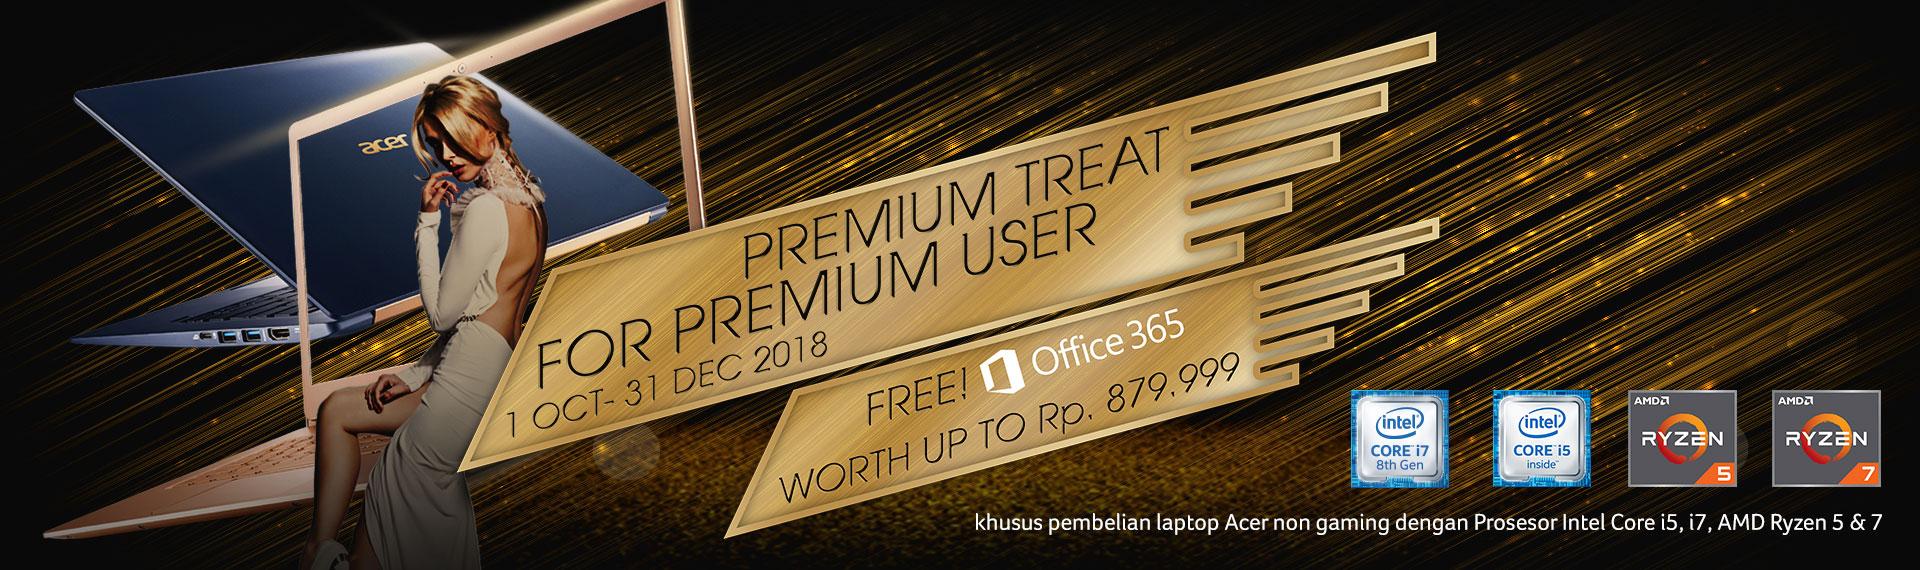 Ingin Dapat Office 365 Gratis? Buruan Beli Laptop Thin and Light Acer!